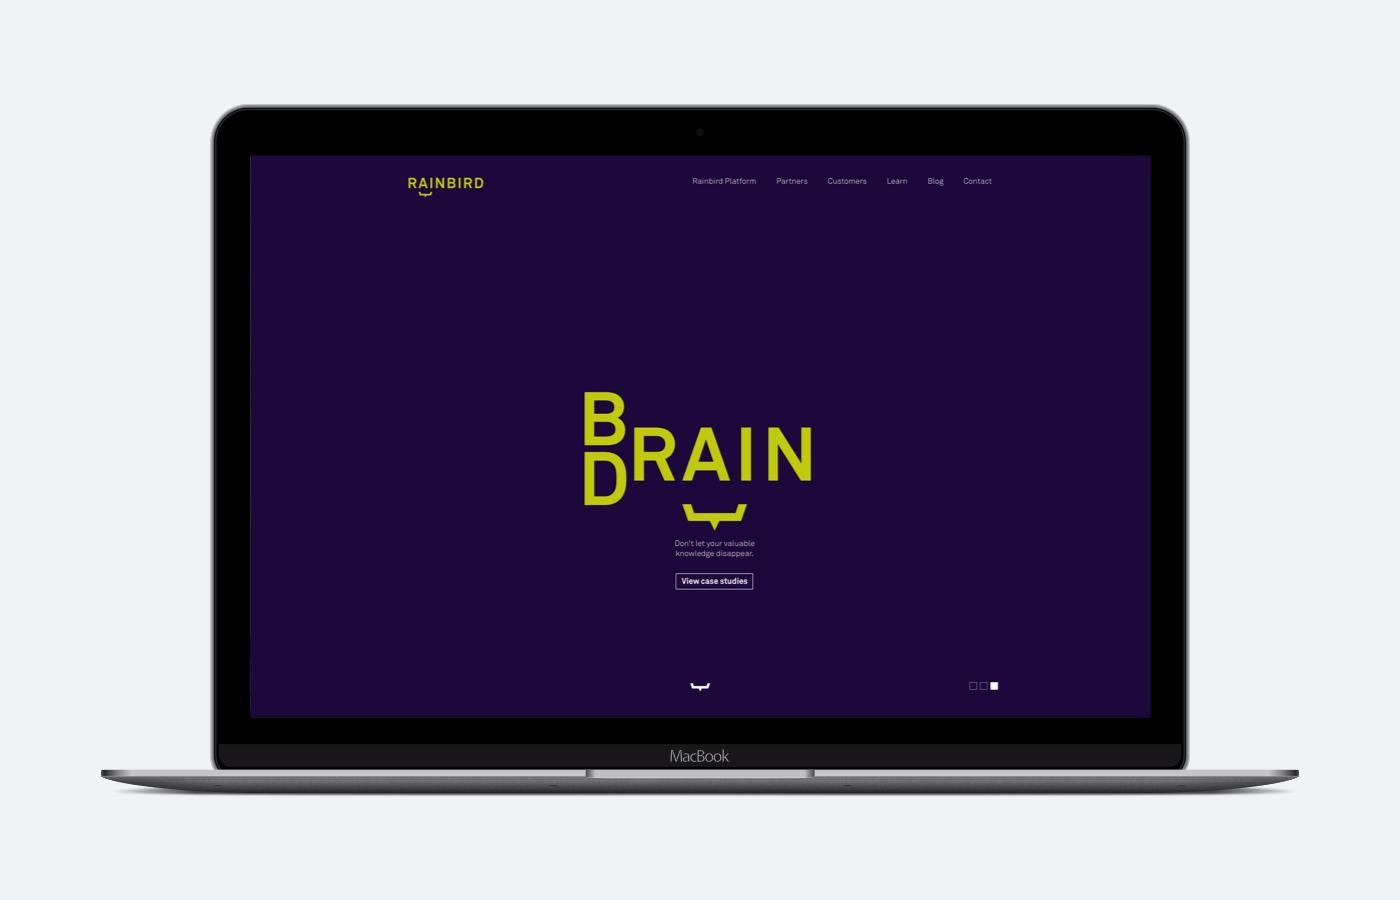 Rainbird AI website launches